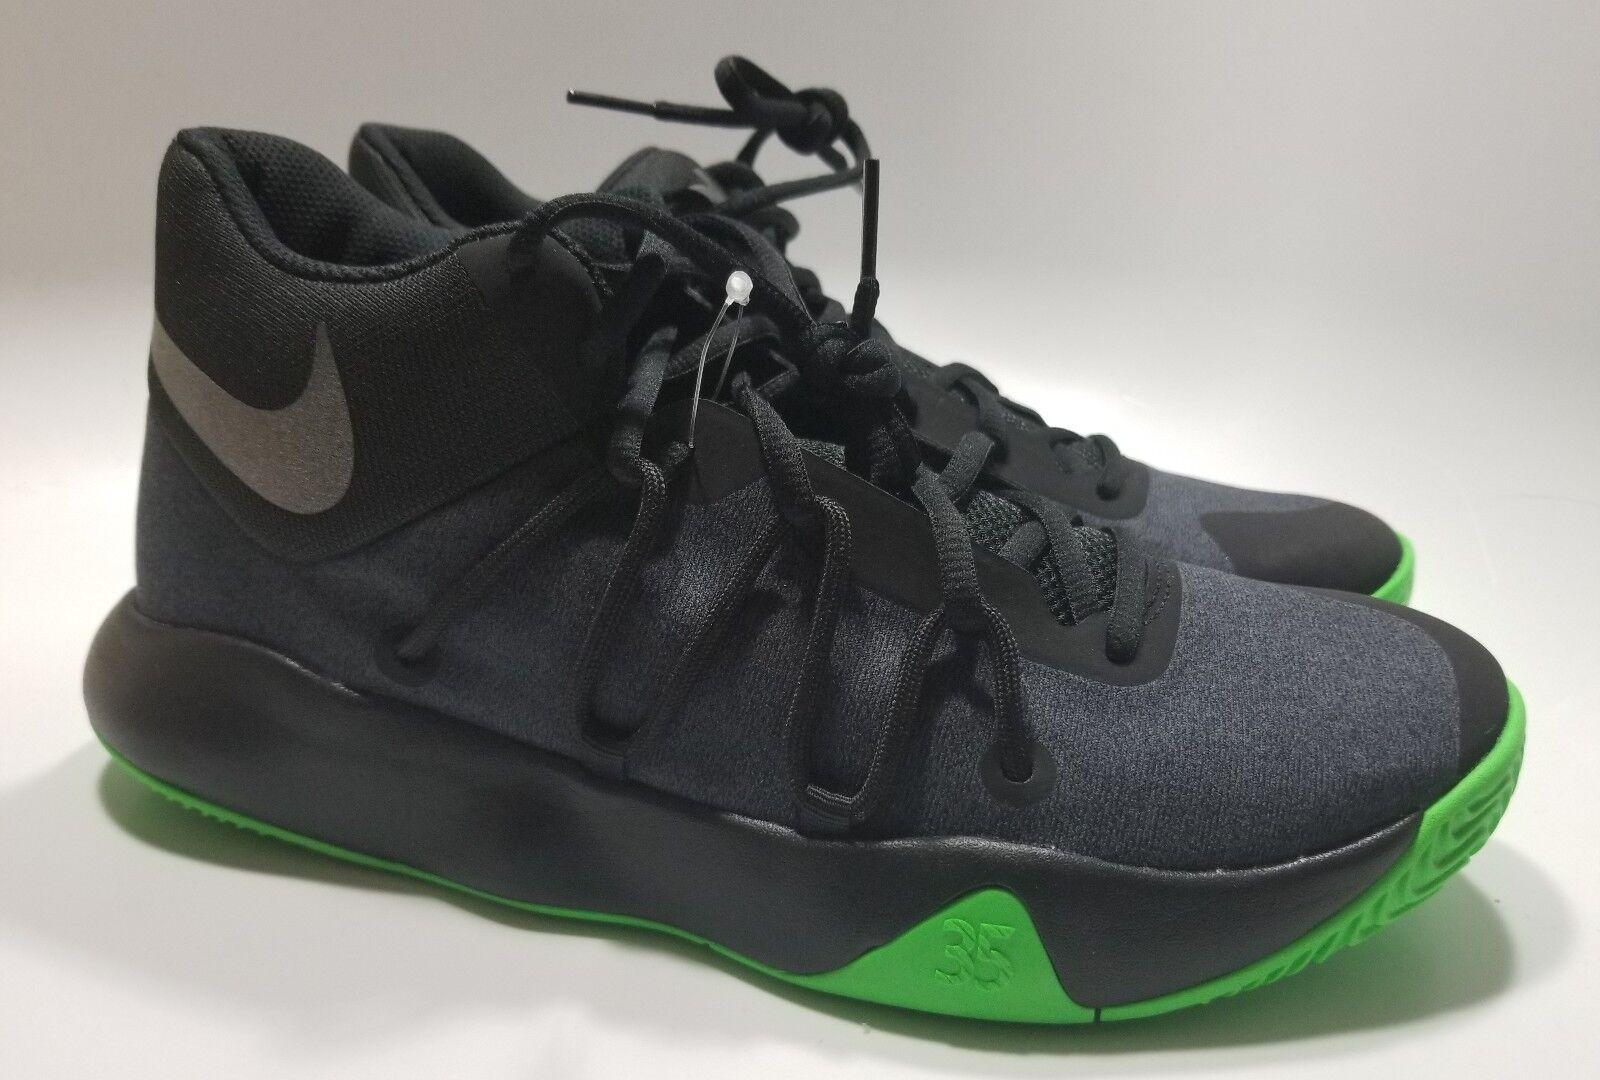 Männer - nike kd trey / basketball - schuhe schwarz / grün schwarze feder 897638-003.